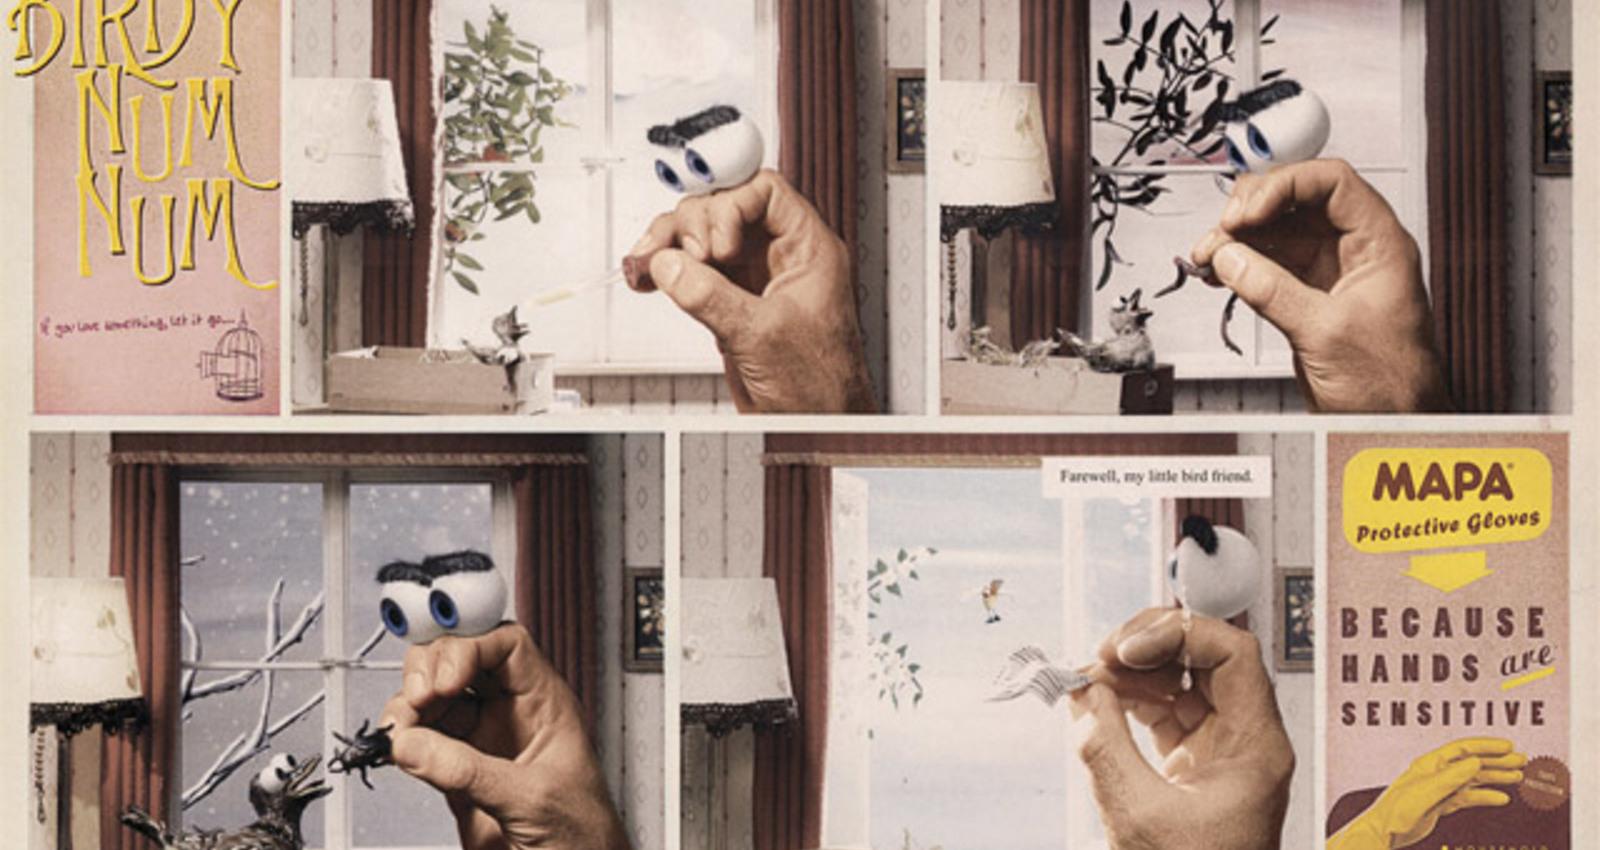 Sensitive hands campaign